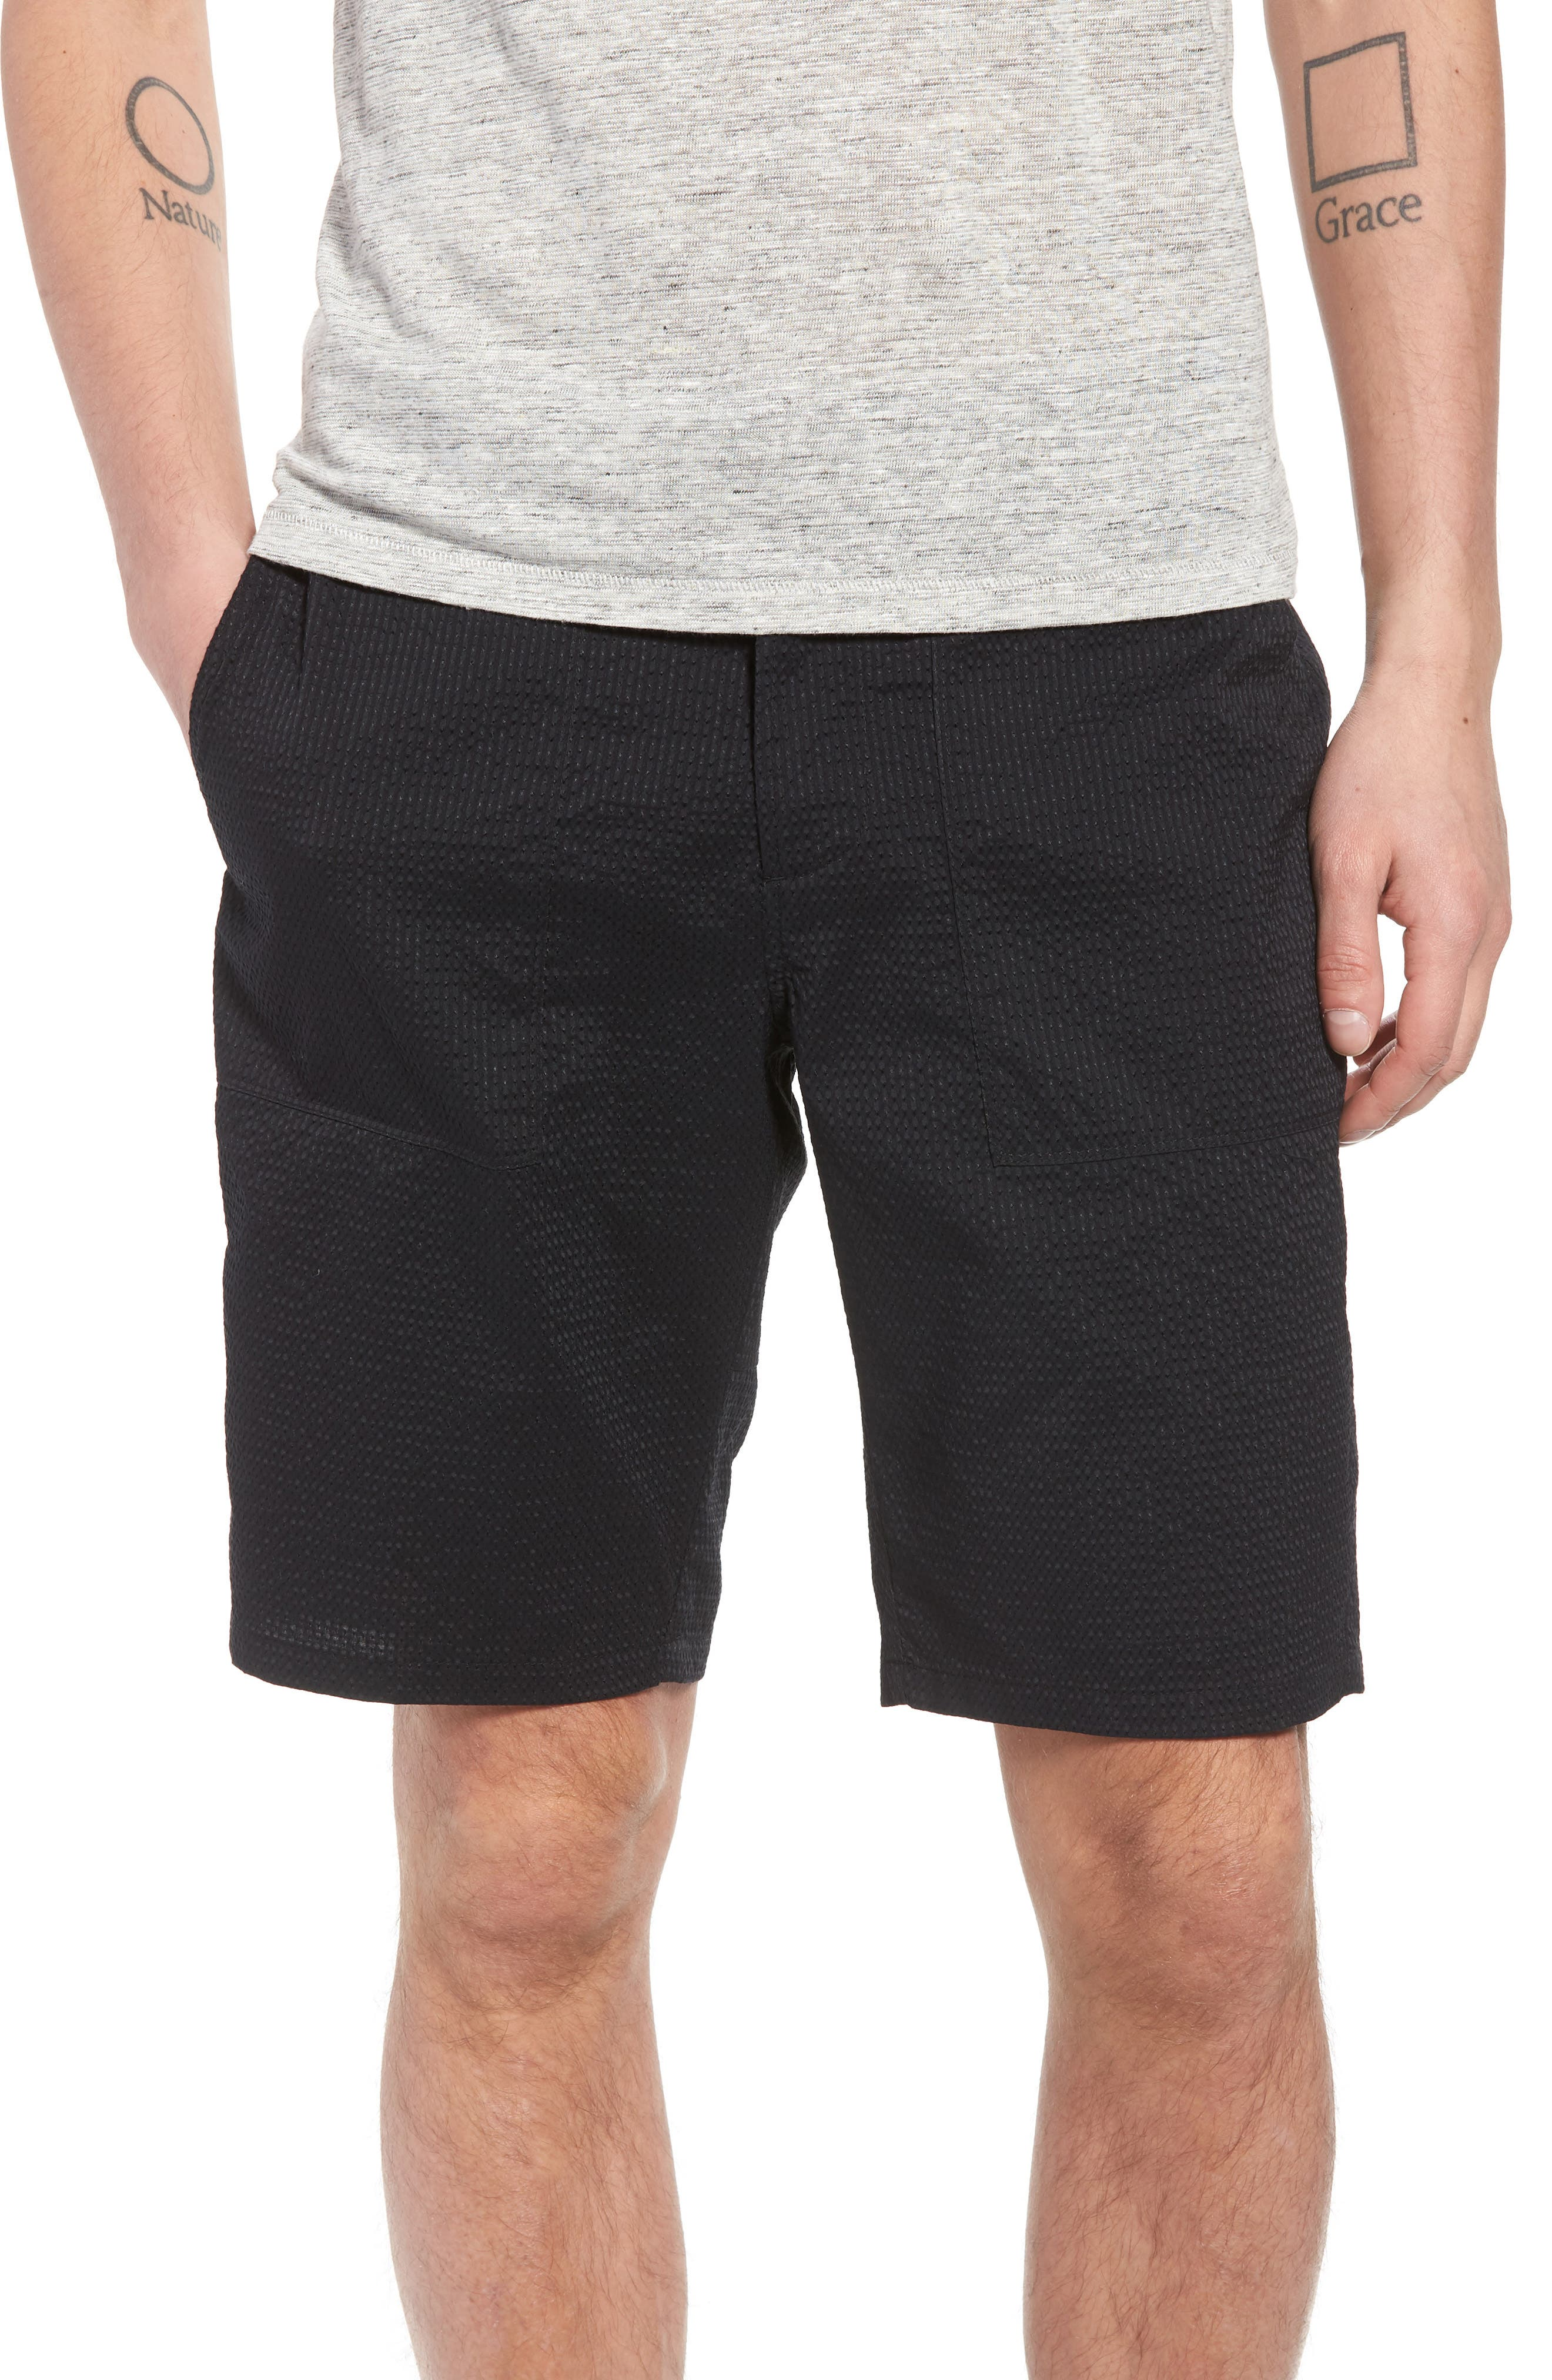 Utility Seersucker Shorts,                             Main thumbnail 1, color,                             Black Seersucker